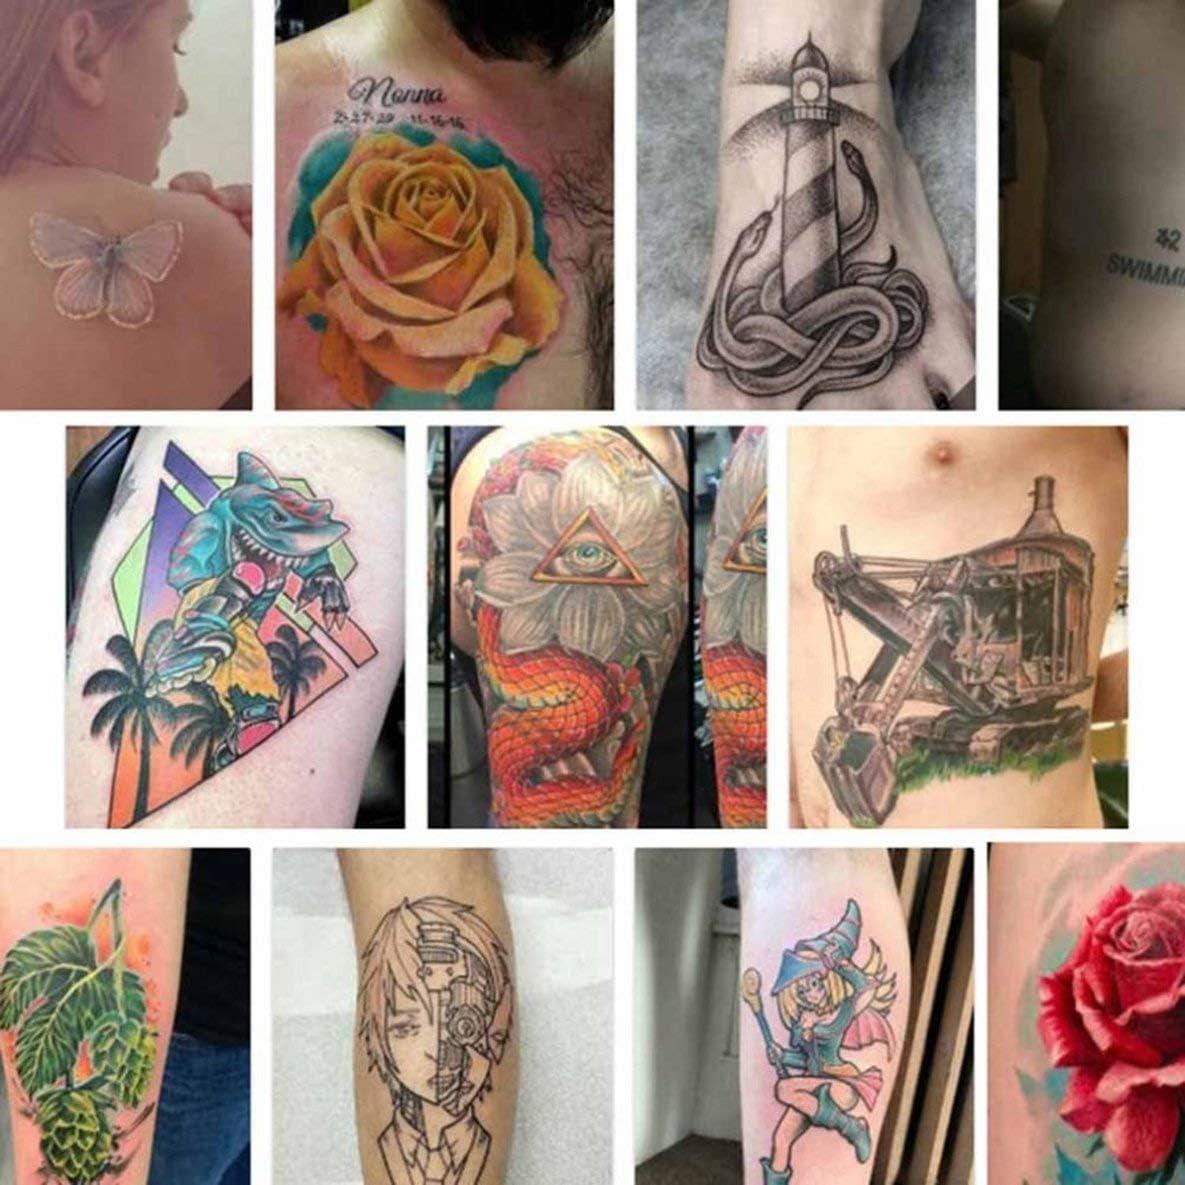 Rouku 1 Book Semi Permanent 635 Paterns Tattoo Template Album Body Art Cream Cone Tattoo Stencils For Makeup Airbrush Painting Card